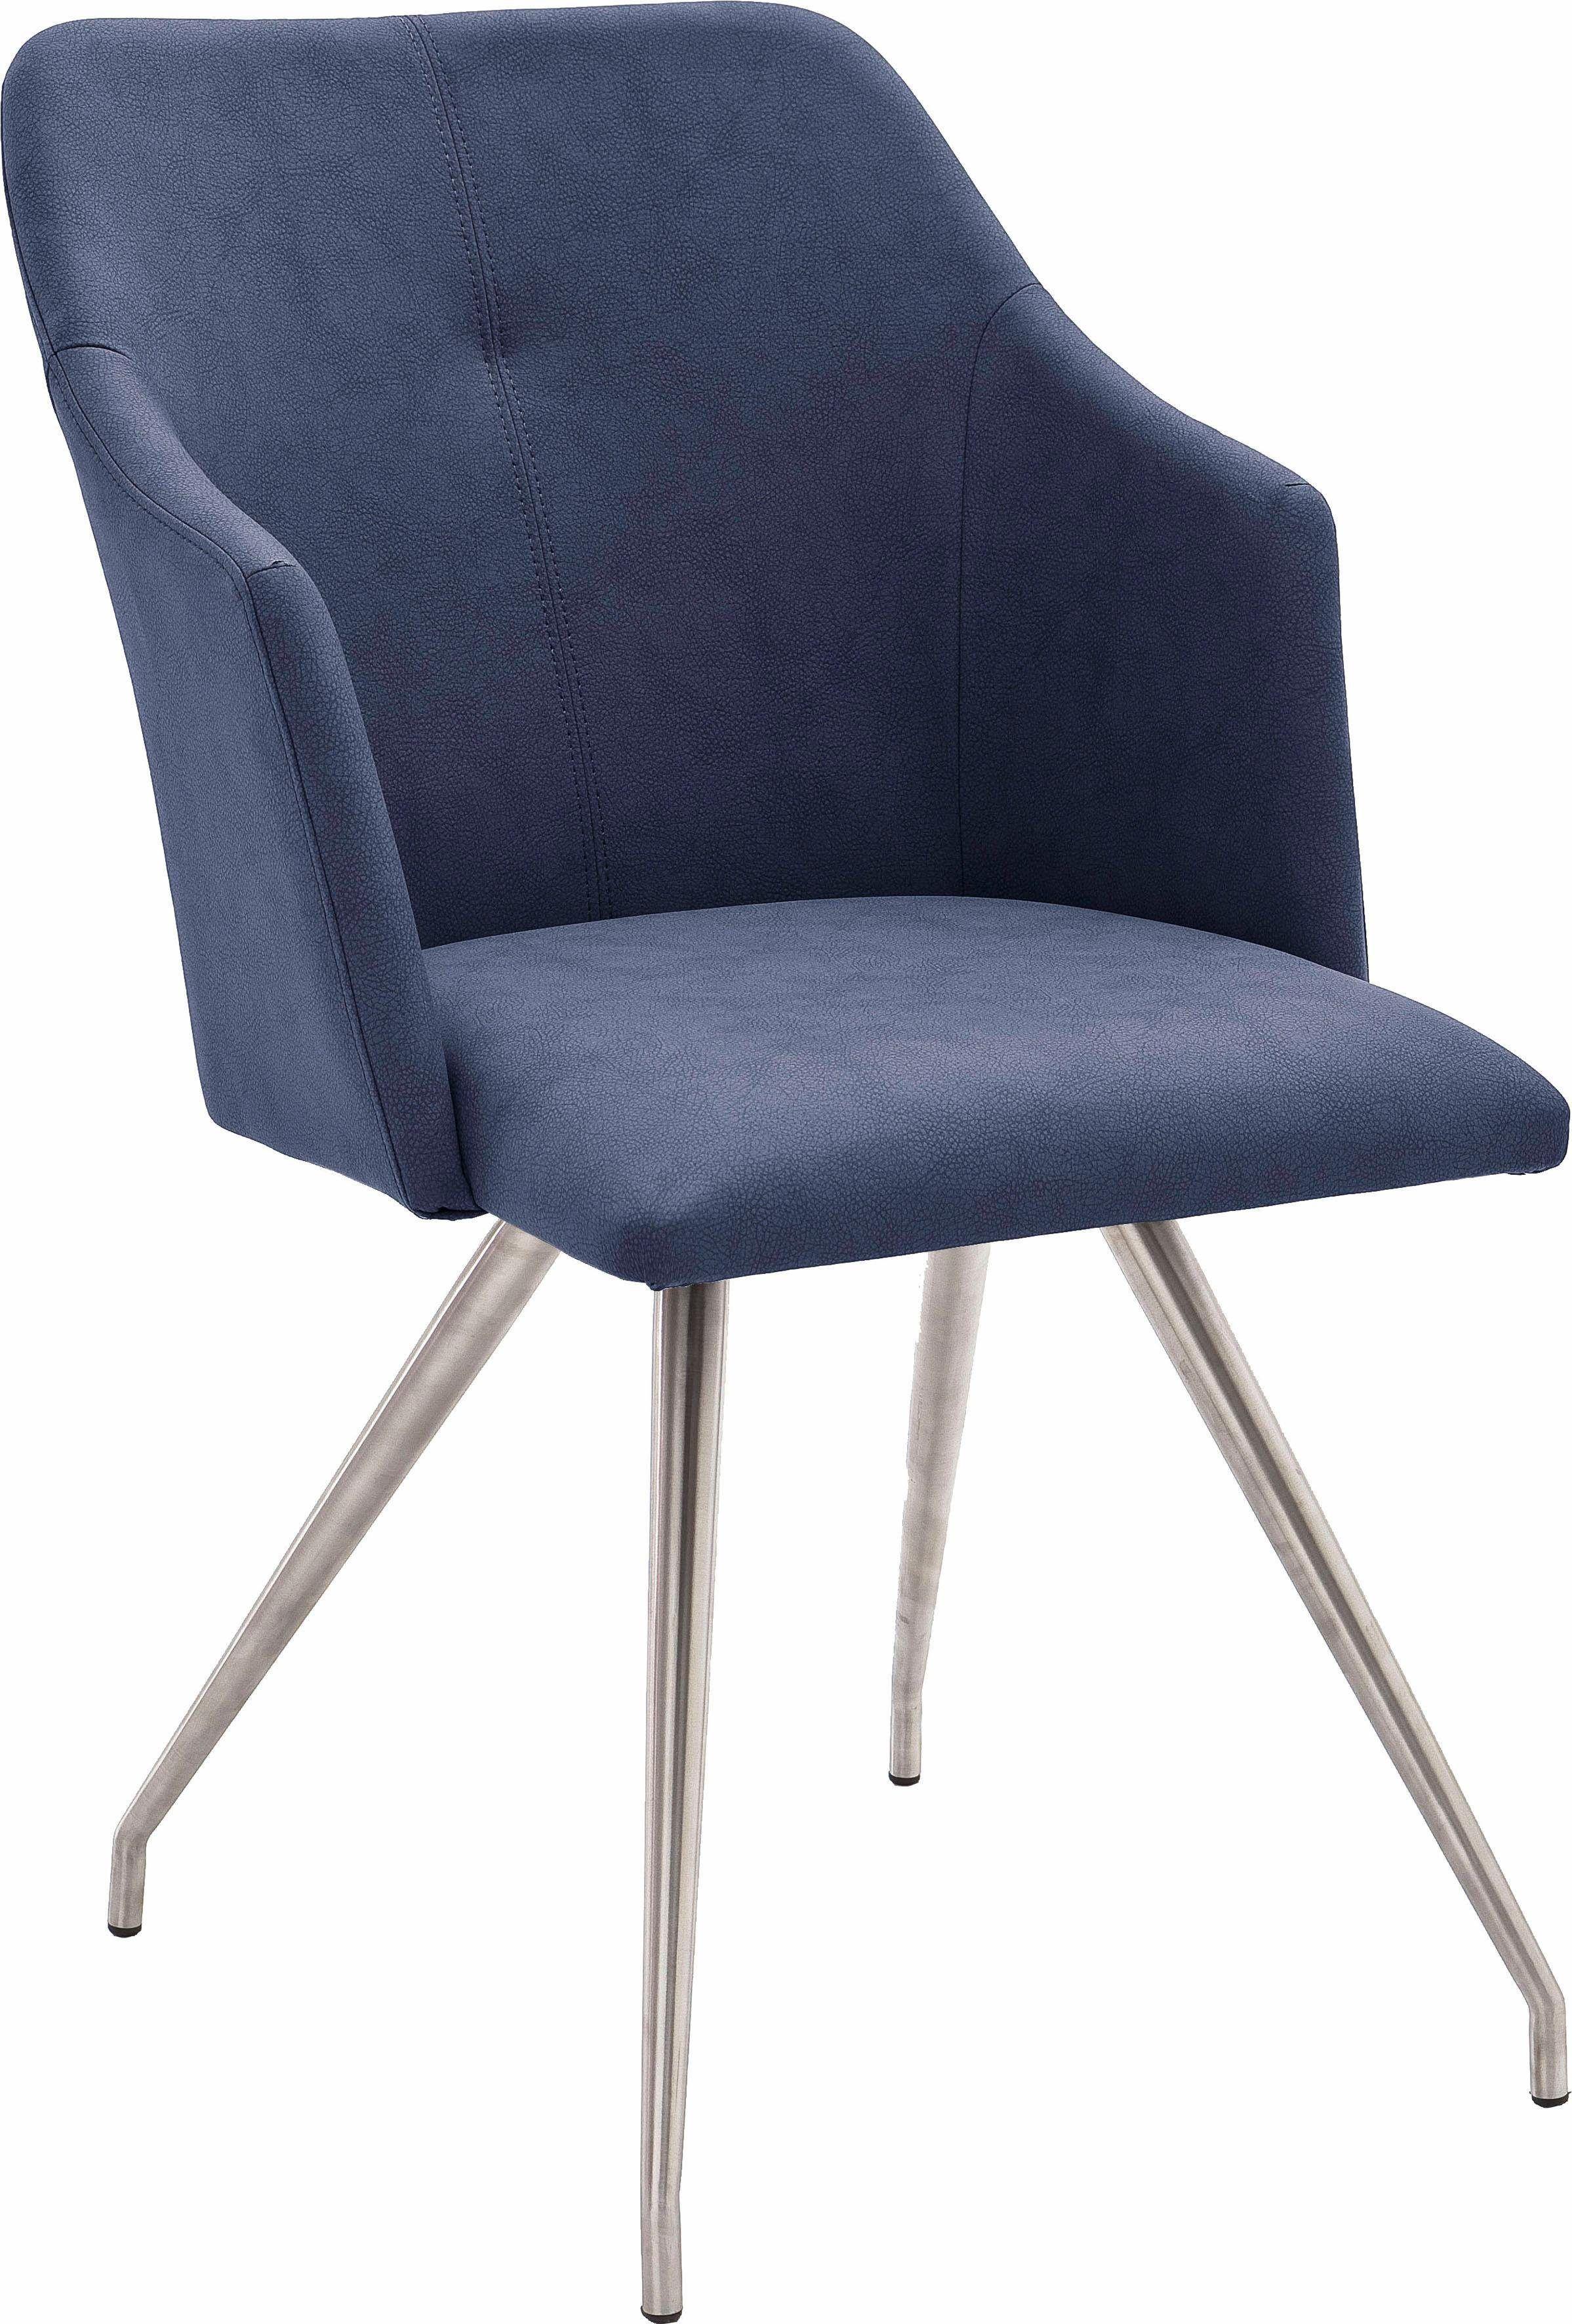 Stühle (2 Stück) Blau, 4 Fuß Stuhl Oval, Pflegeleichtes Kunstleder,